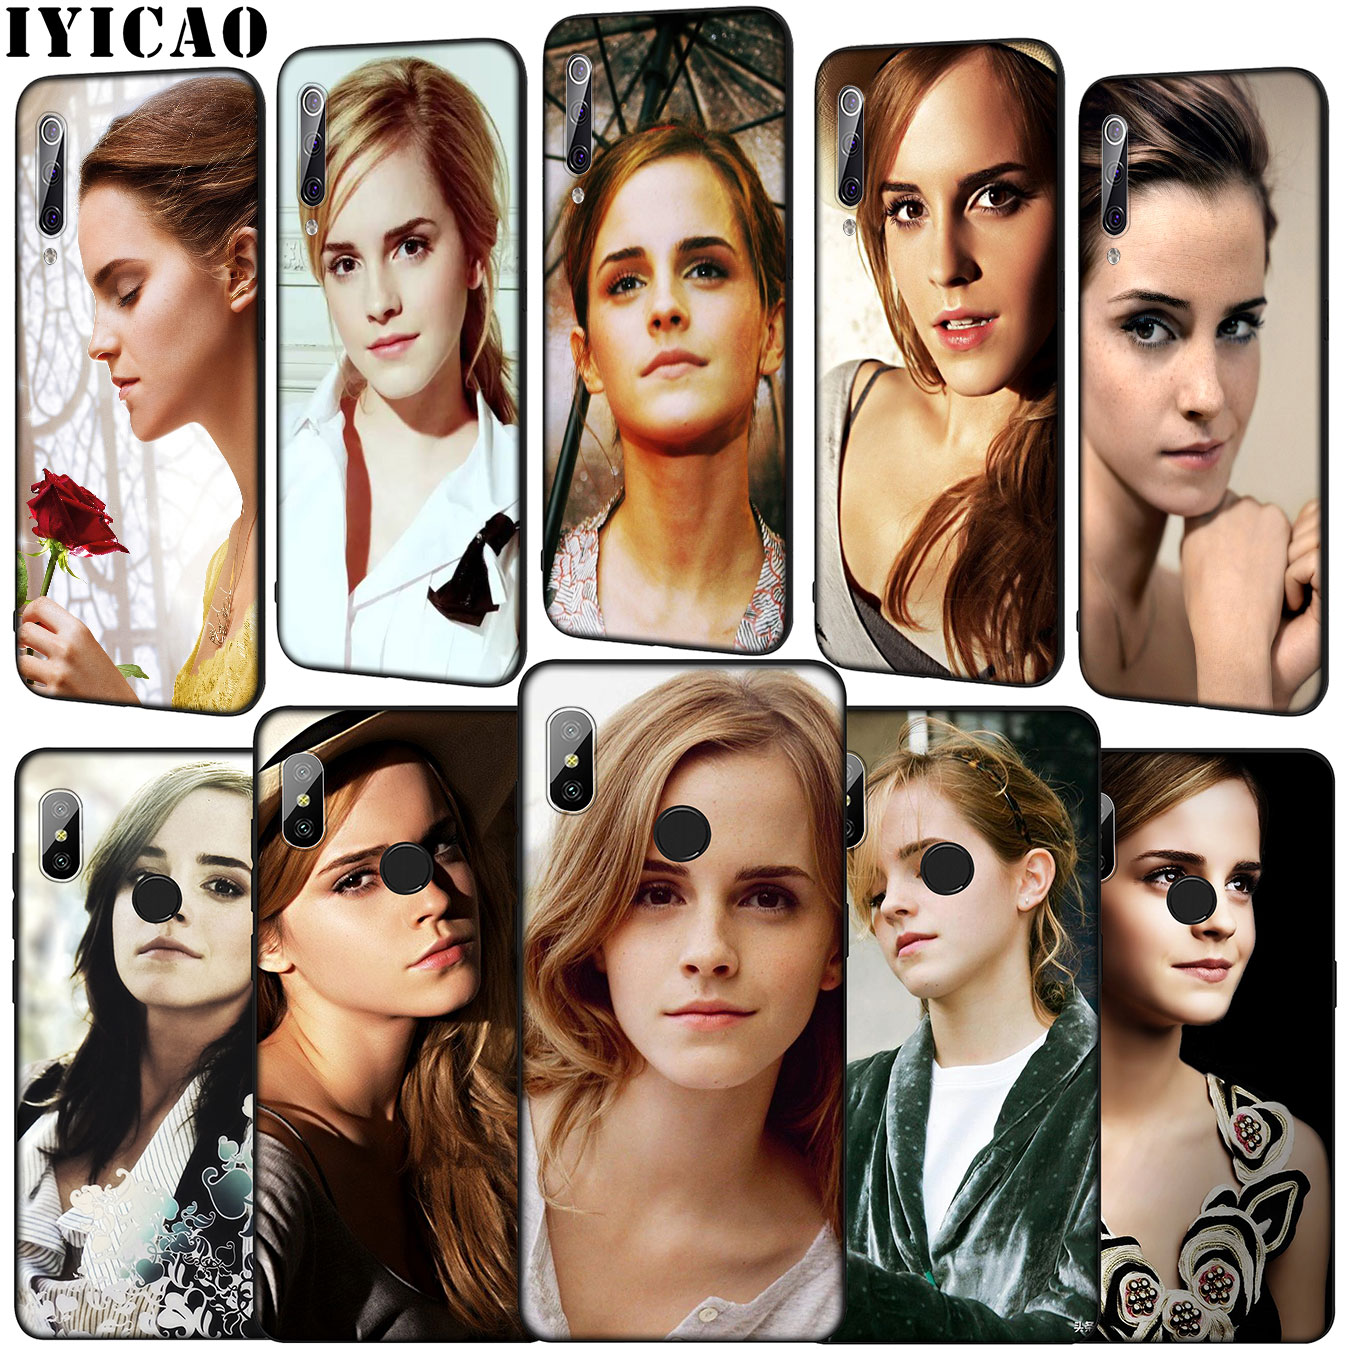 IYICAO Emma Watson suave funda de teléfono para Xiaomi Mi 10 9 9T A3 Pro CC9 CC9E 8 SE A2 Lite A1 6 teléfono móvil f1 Mi9